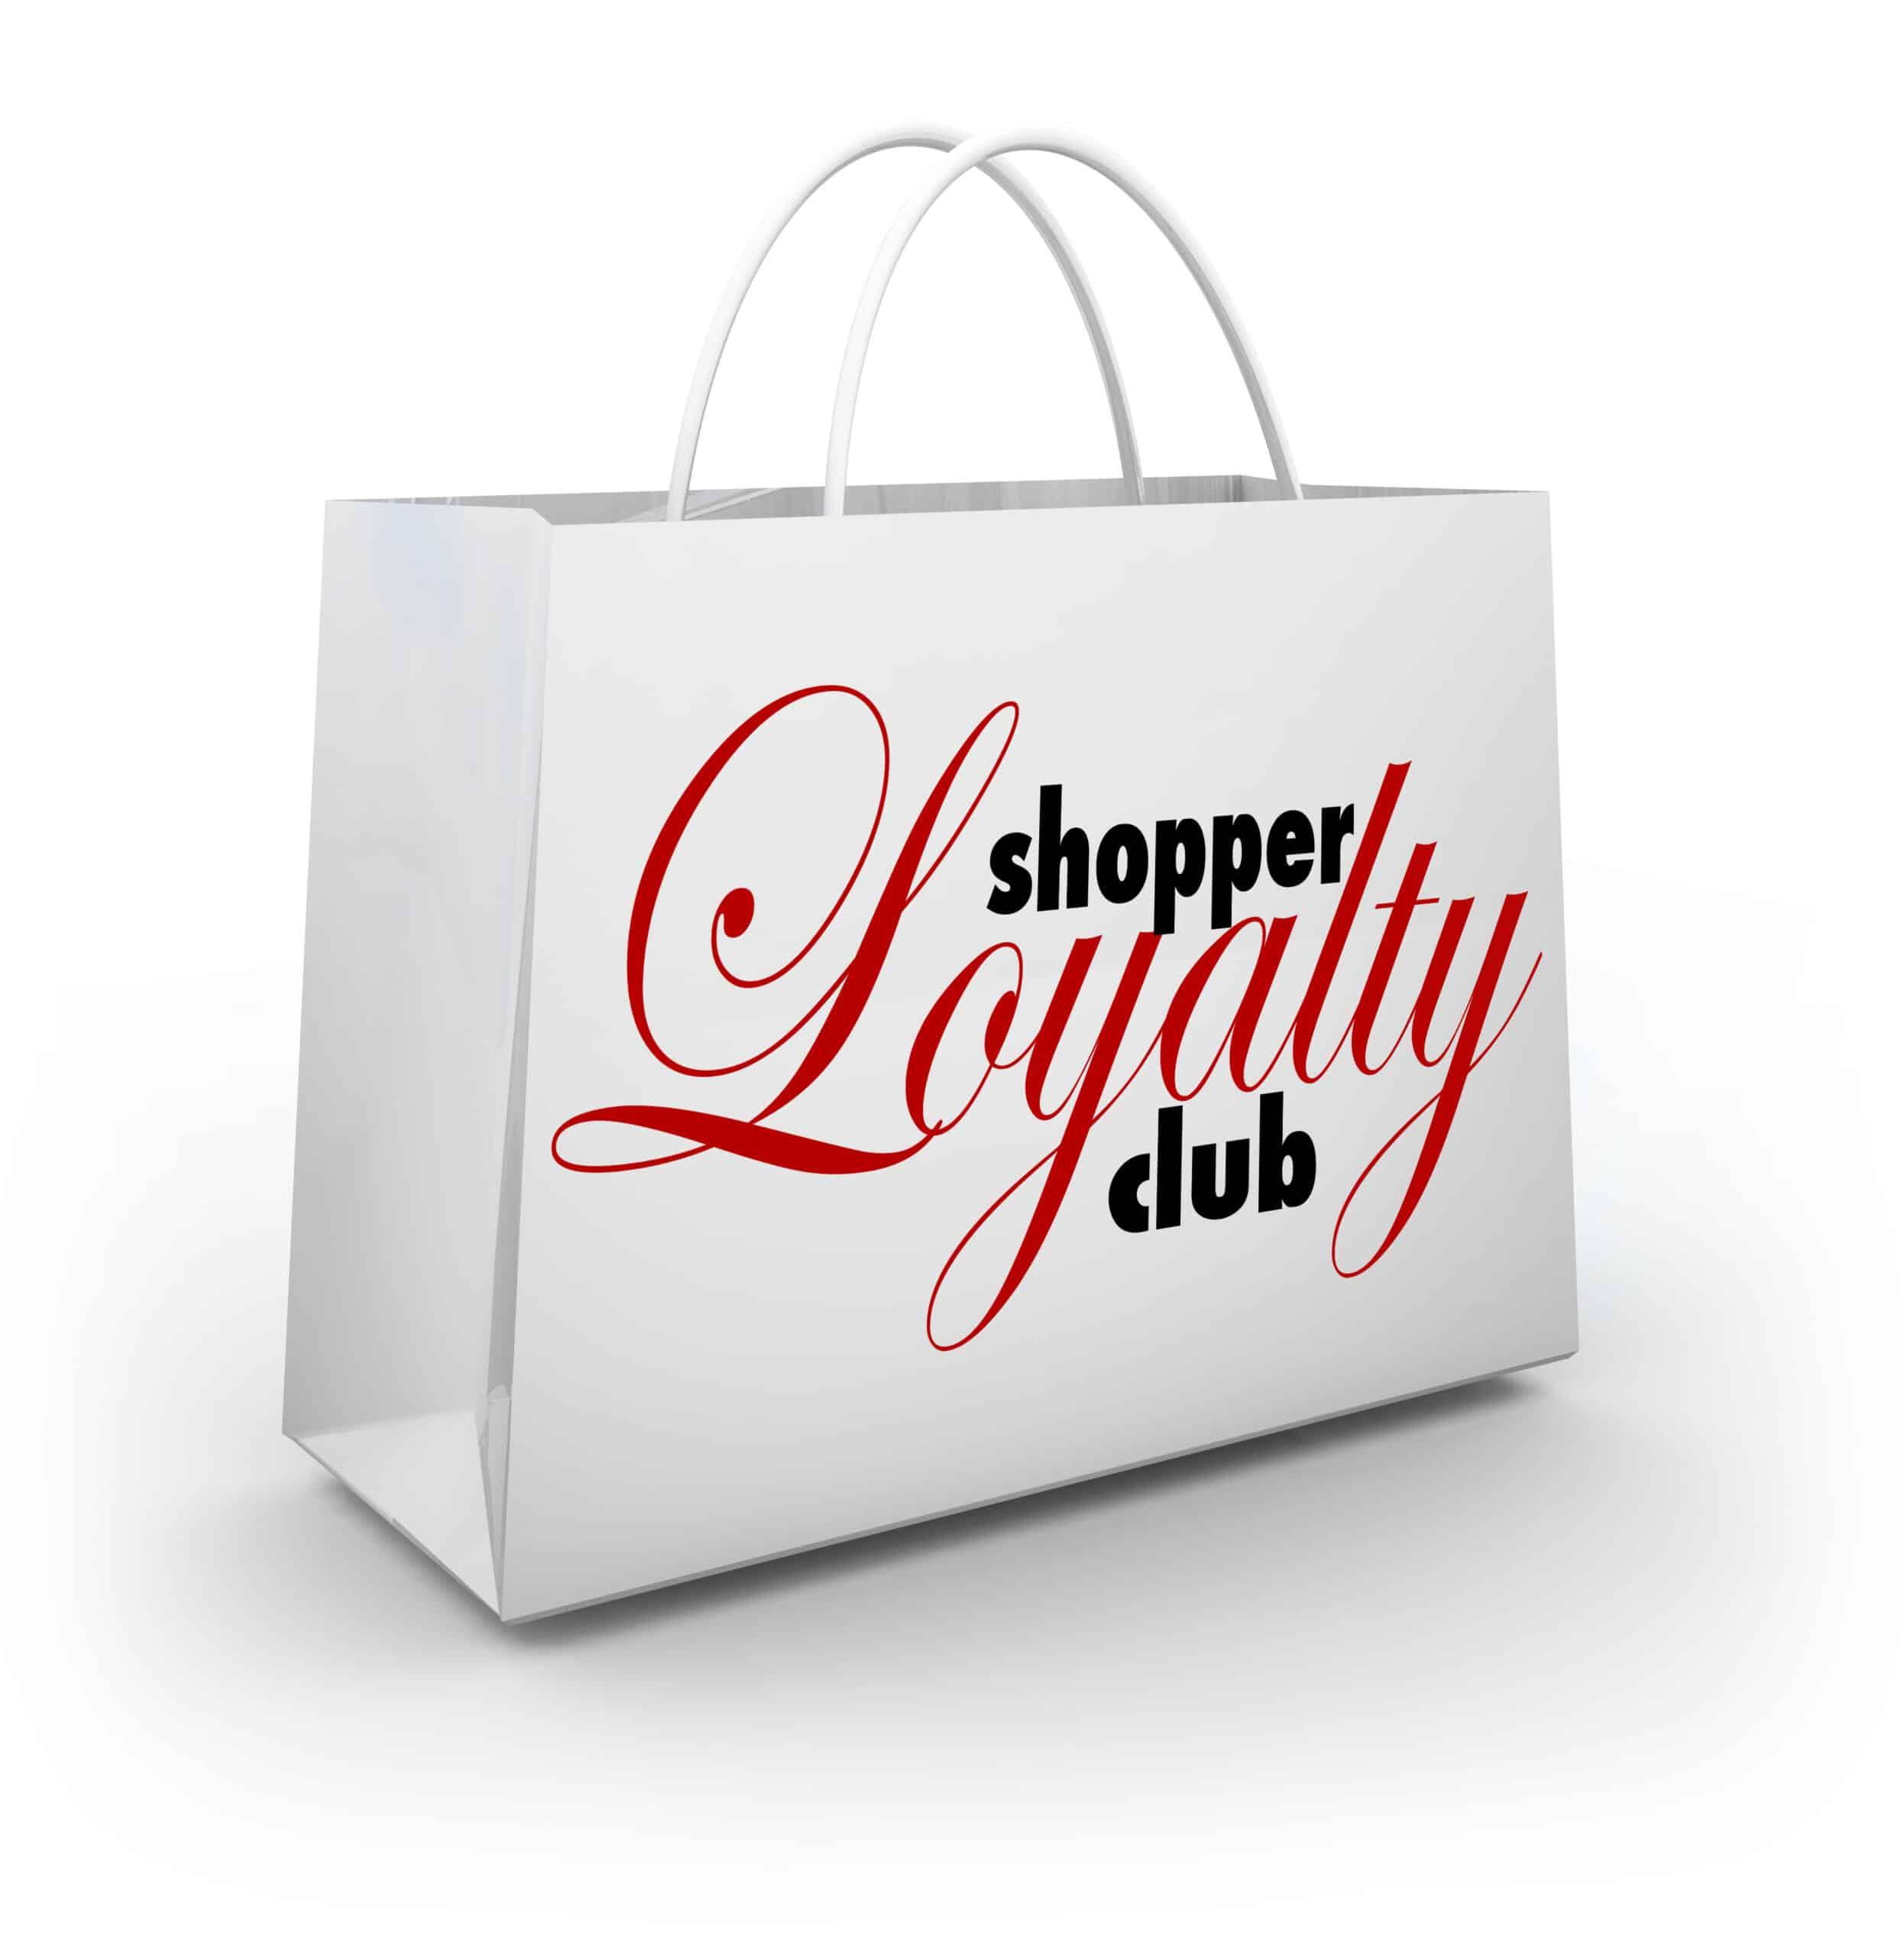 Loyalty Program Success Depends On Great CX